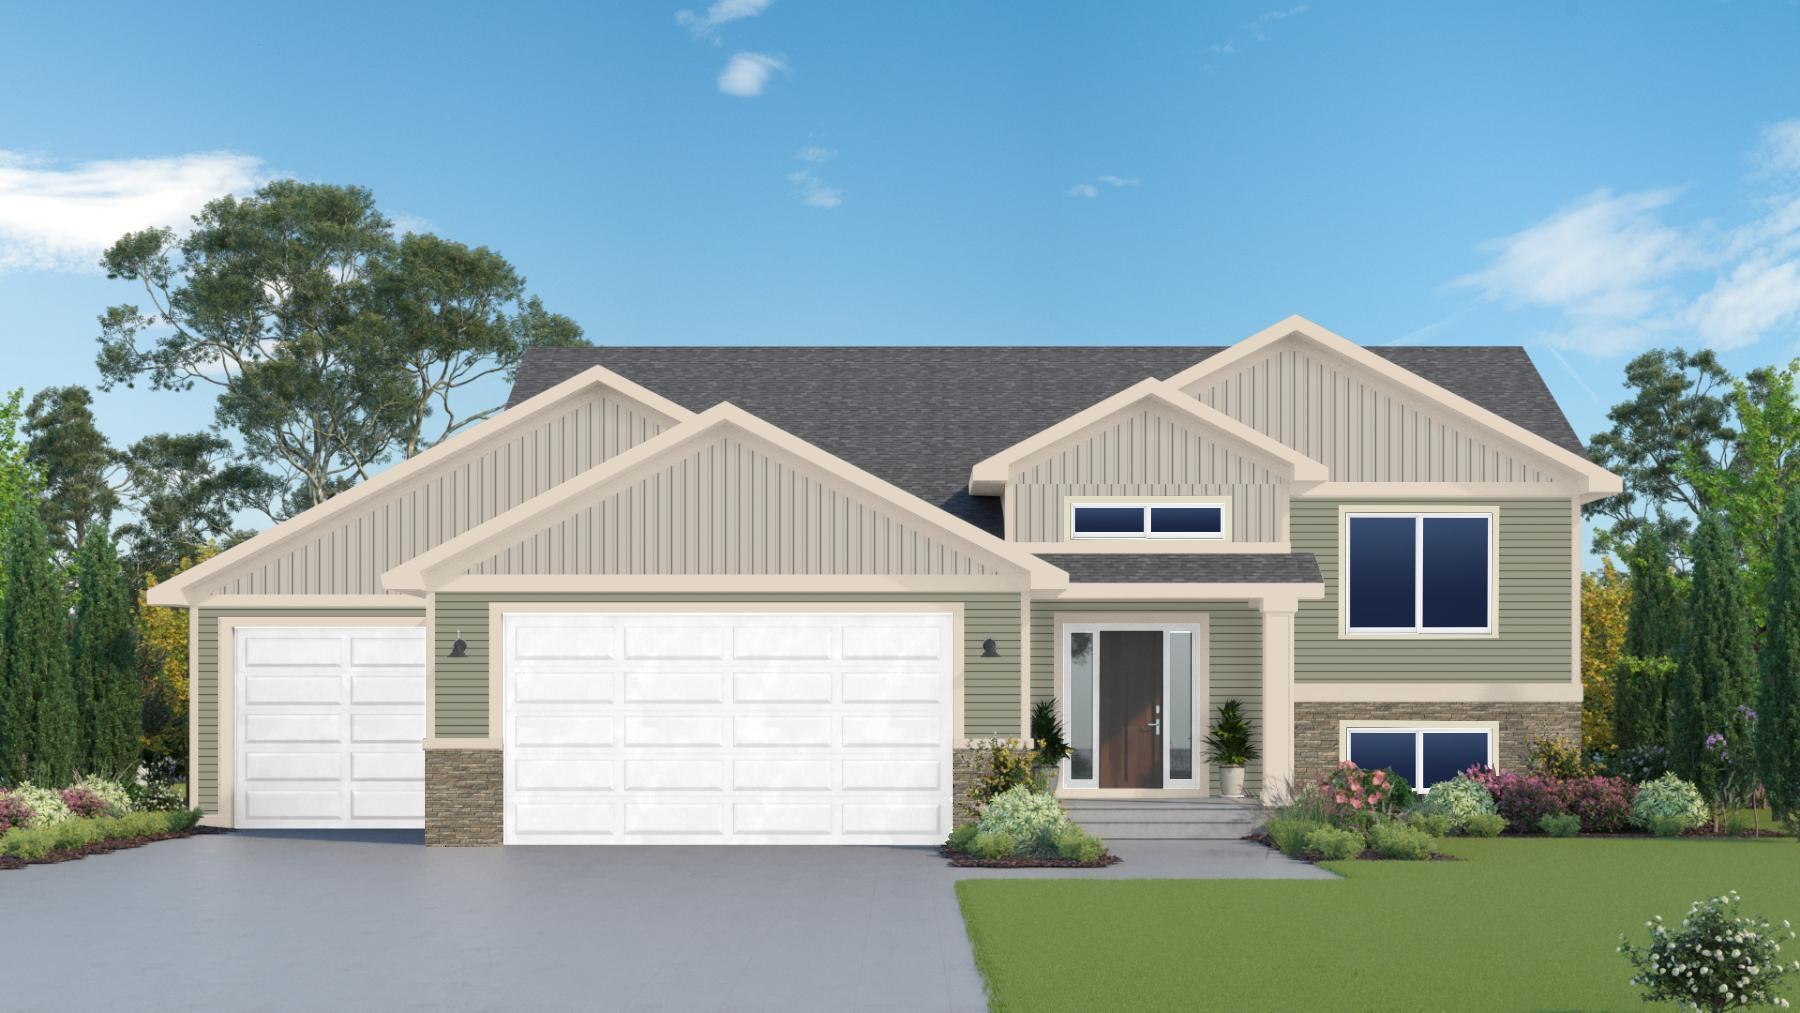 Rendering - 1107 7th Ave NW (Stone Ridge Lot 1 Block 3) (003)